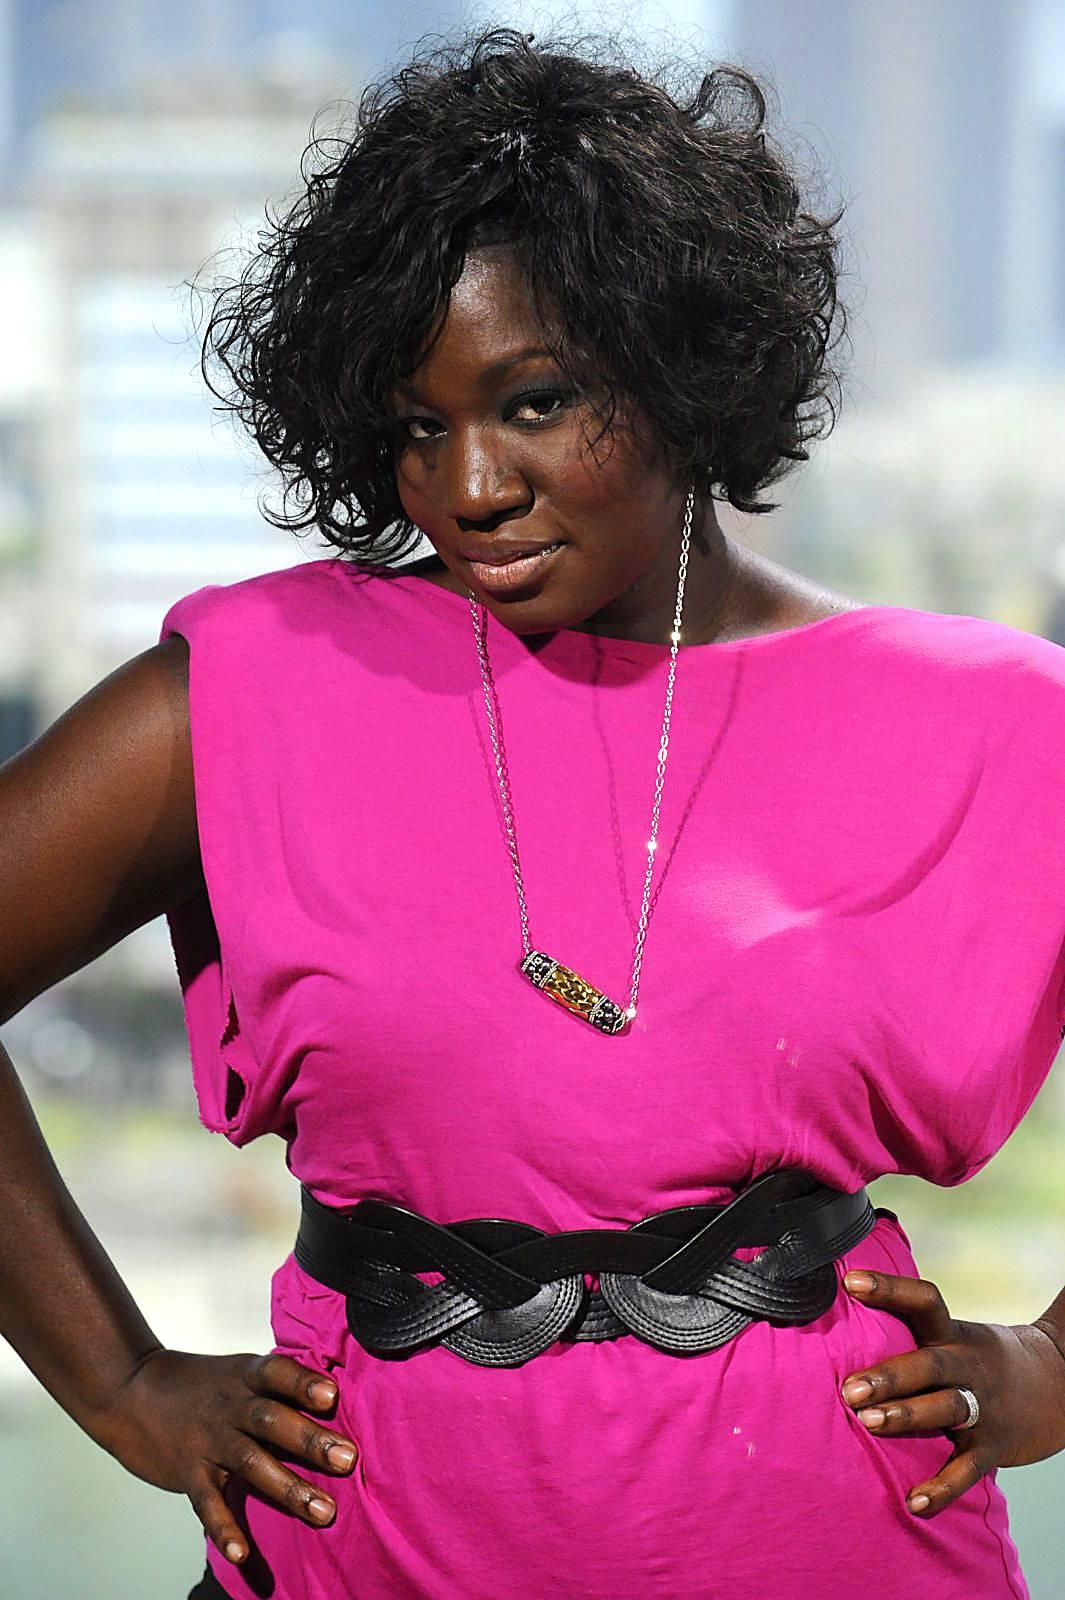 Meet Korto Momolu - Korto Momolu is one of three judges on this season?s Lens on Talent, joining Leslie ?Big Lez? Segar and Rodney Jerkins.(Photo: Phil McCarten/PictureGroup)